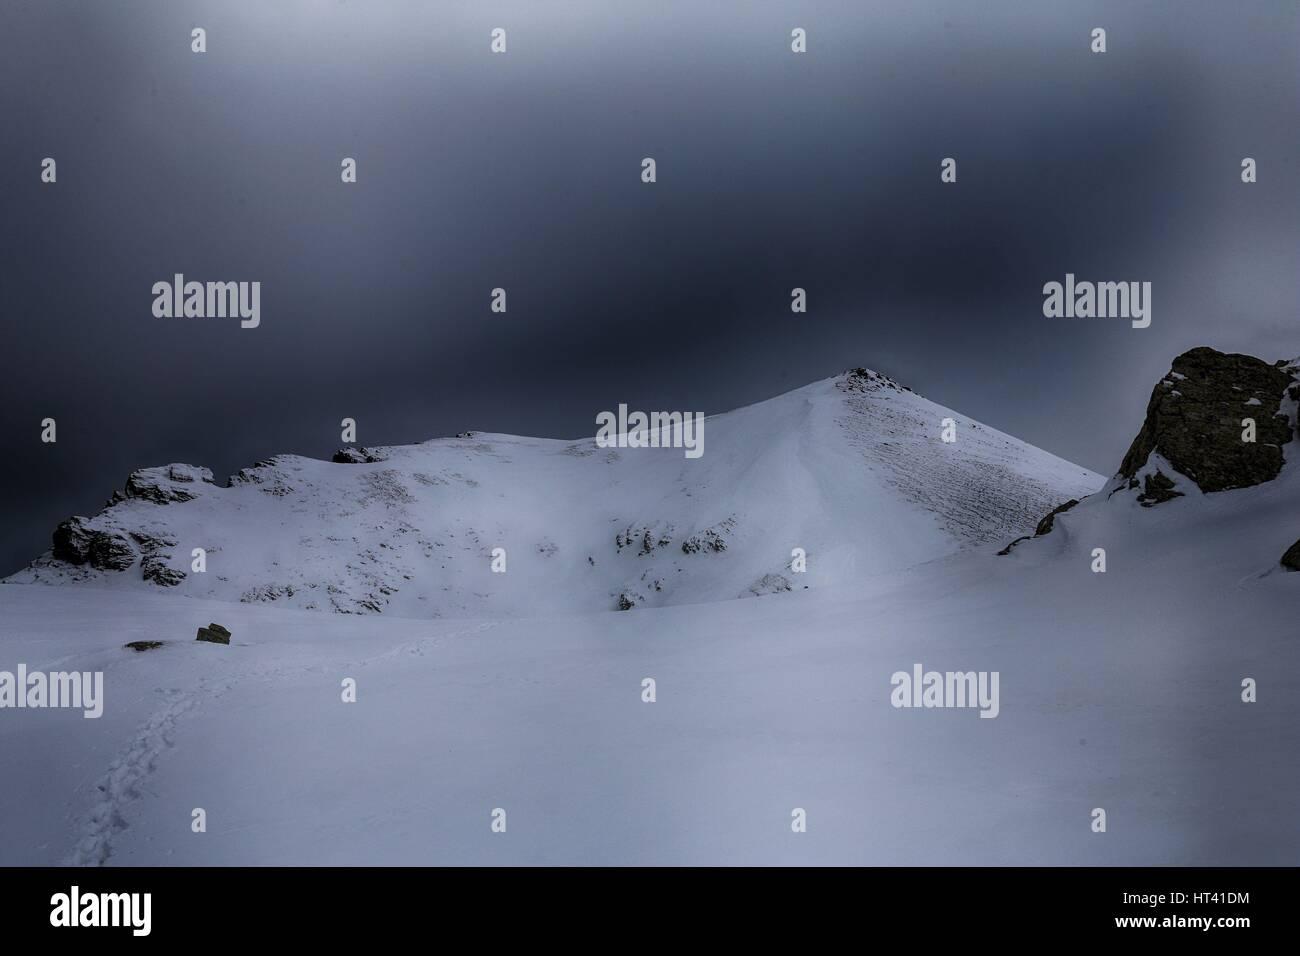 Rudoka / Maja e Njeriut the highest peak of Kosovo on the border with Macedonia in winter - Stock Image